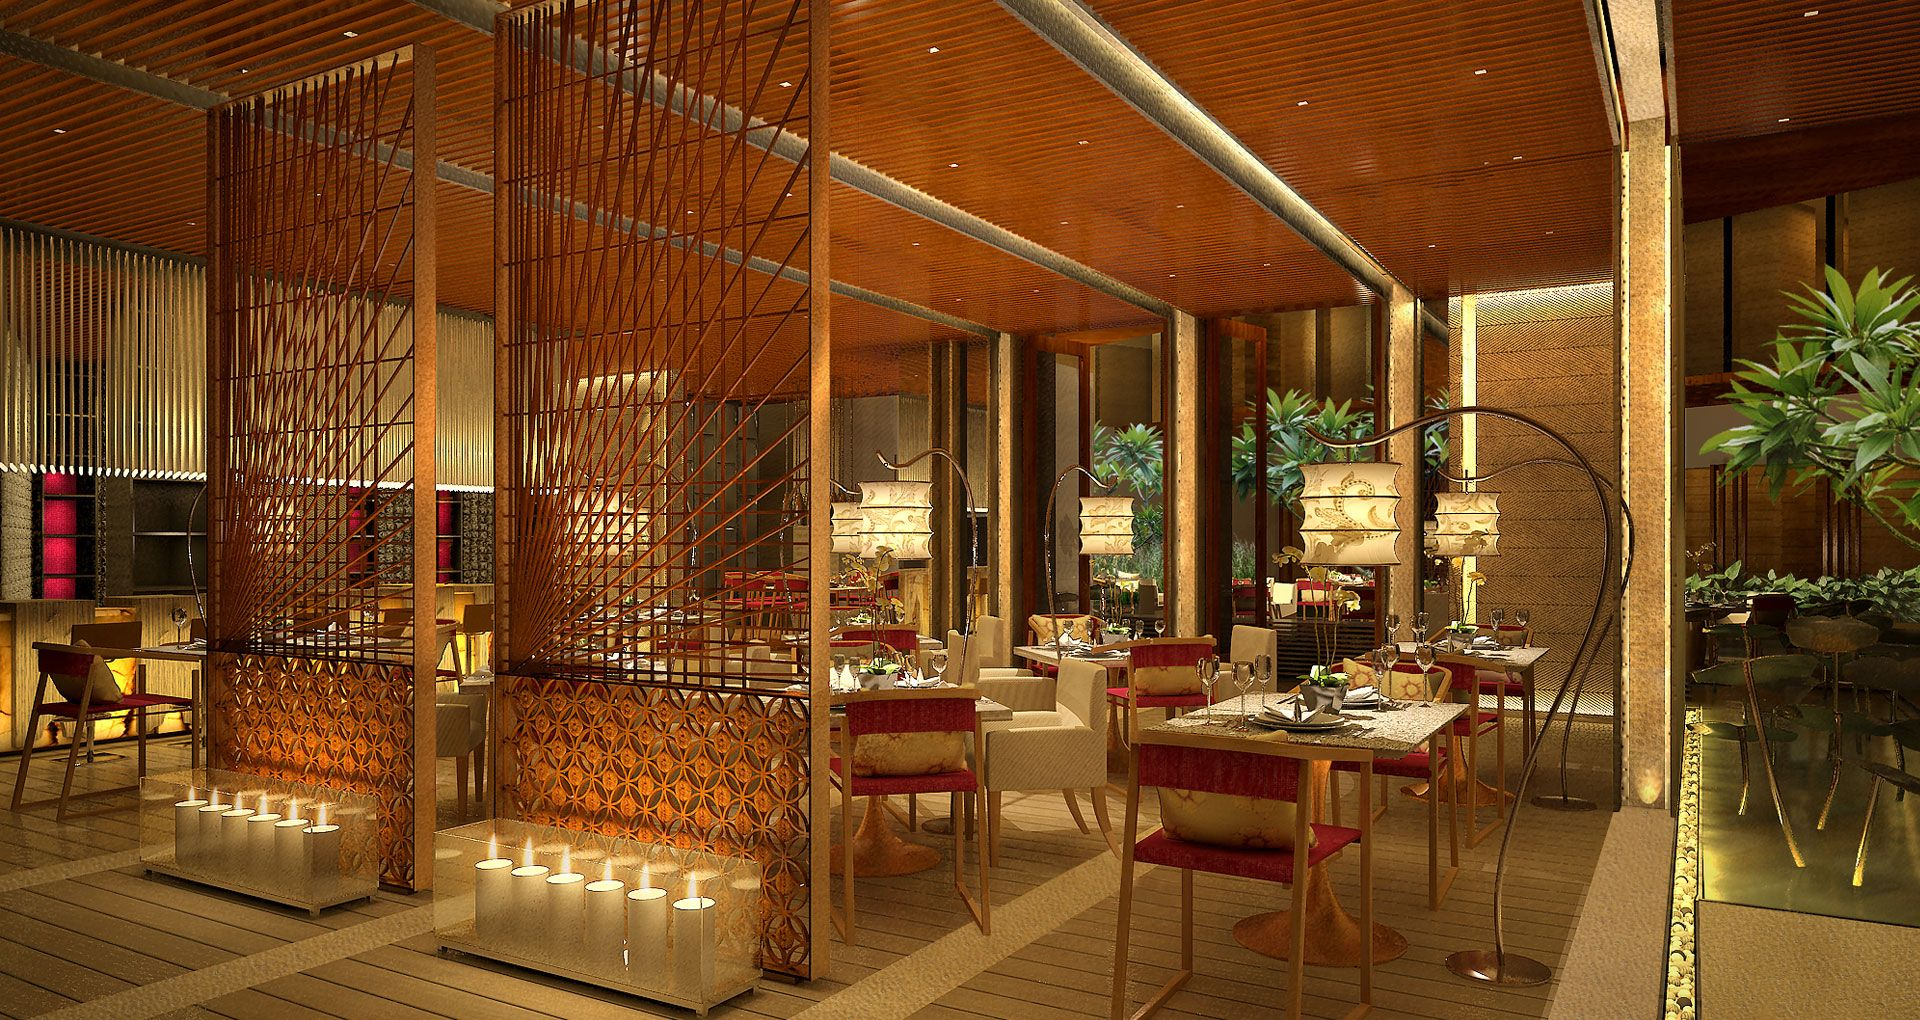 Smart open floors resorts restaurant indian interior for Hospitality interior design